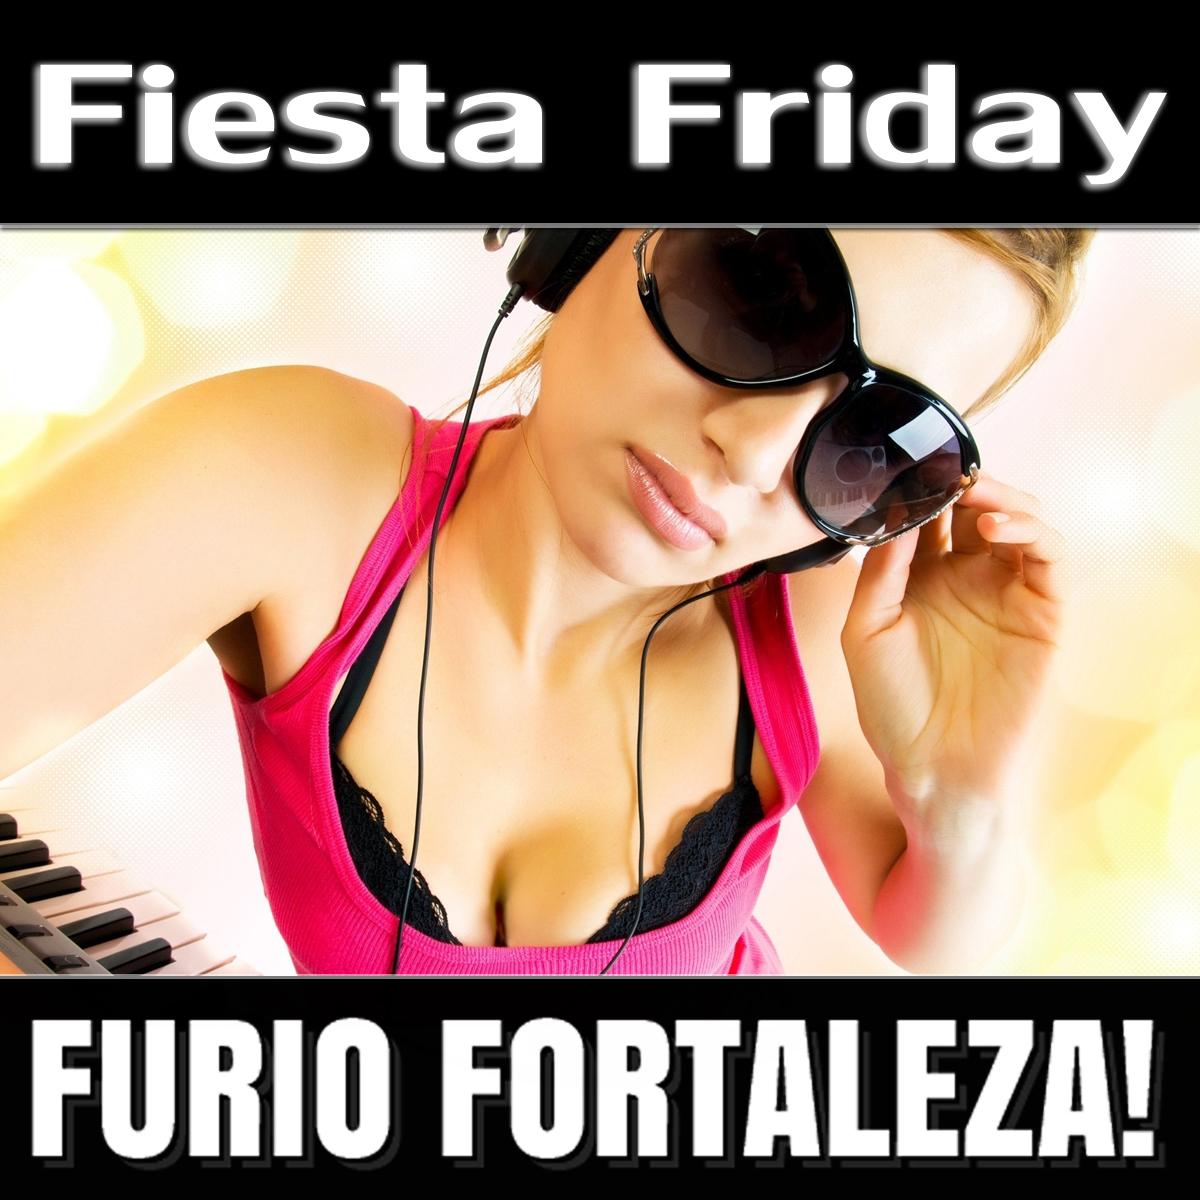 Furio Fortaleza! - 4.2 - Fiesta Friday